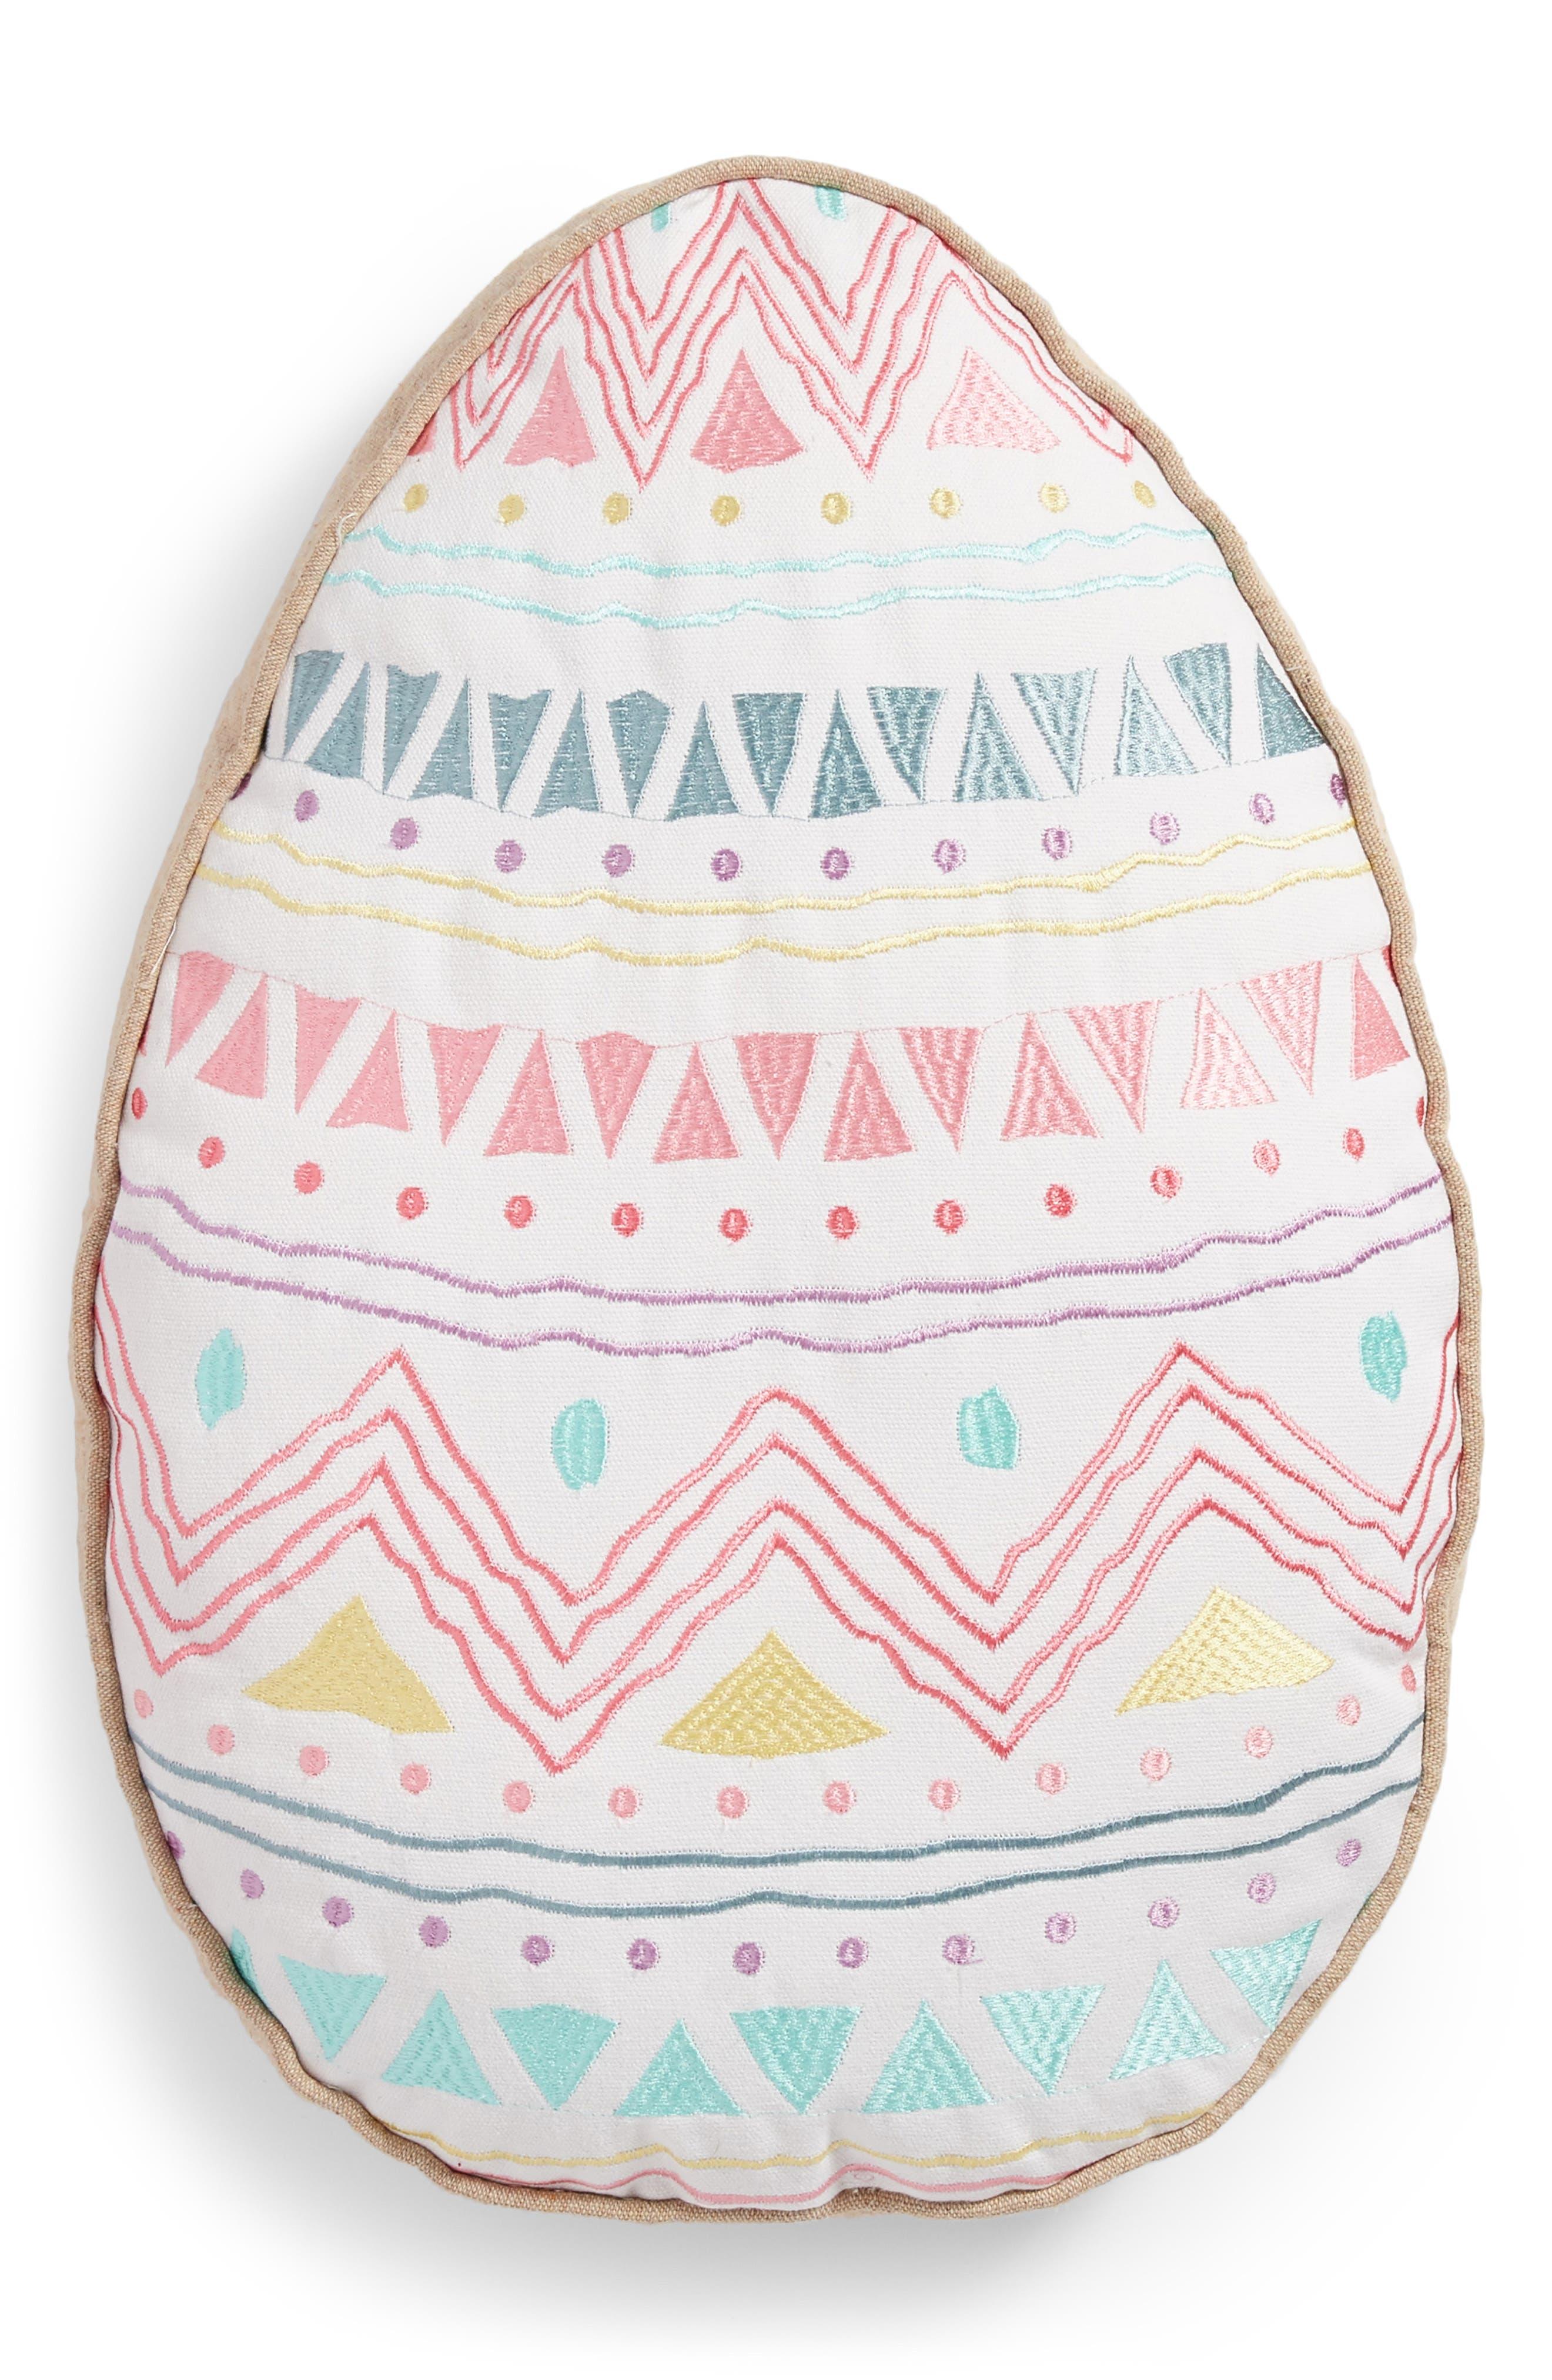 Main Image - Levtex Egg Accent Pillow